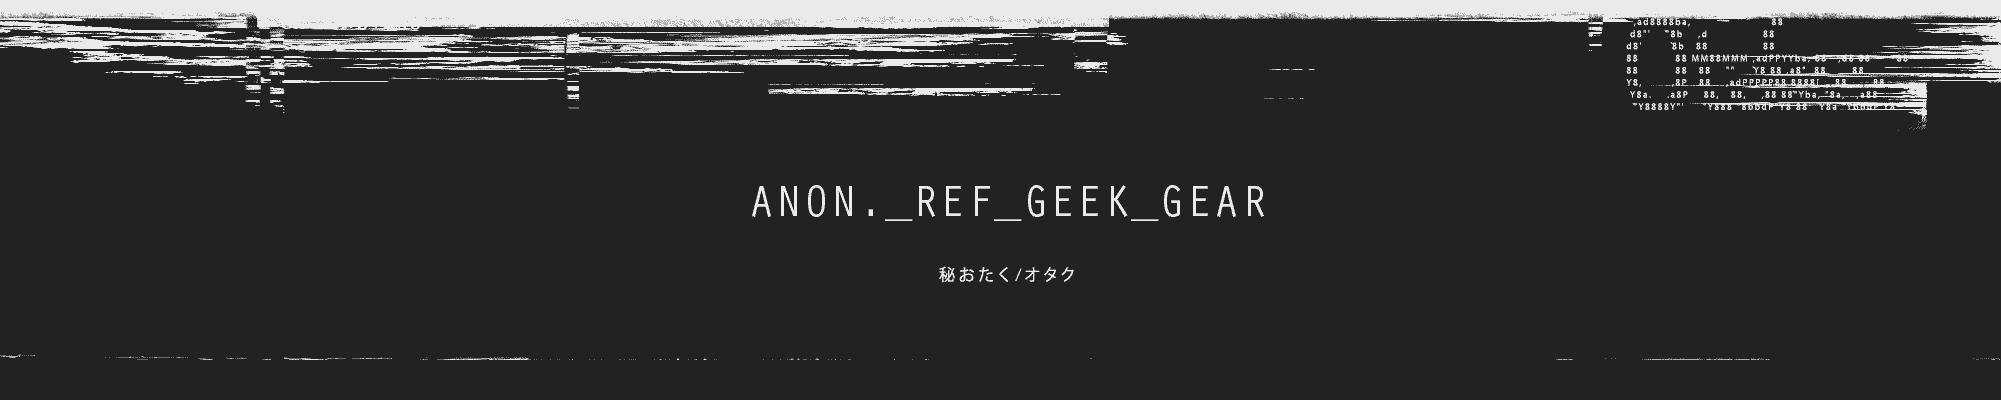 sleepergeek (@sleepergeek) Cover Image